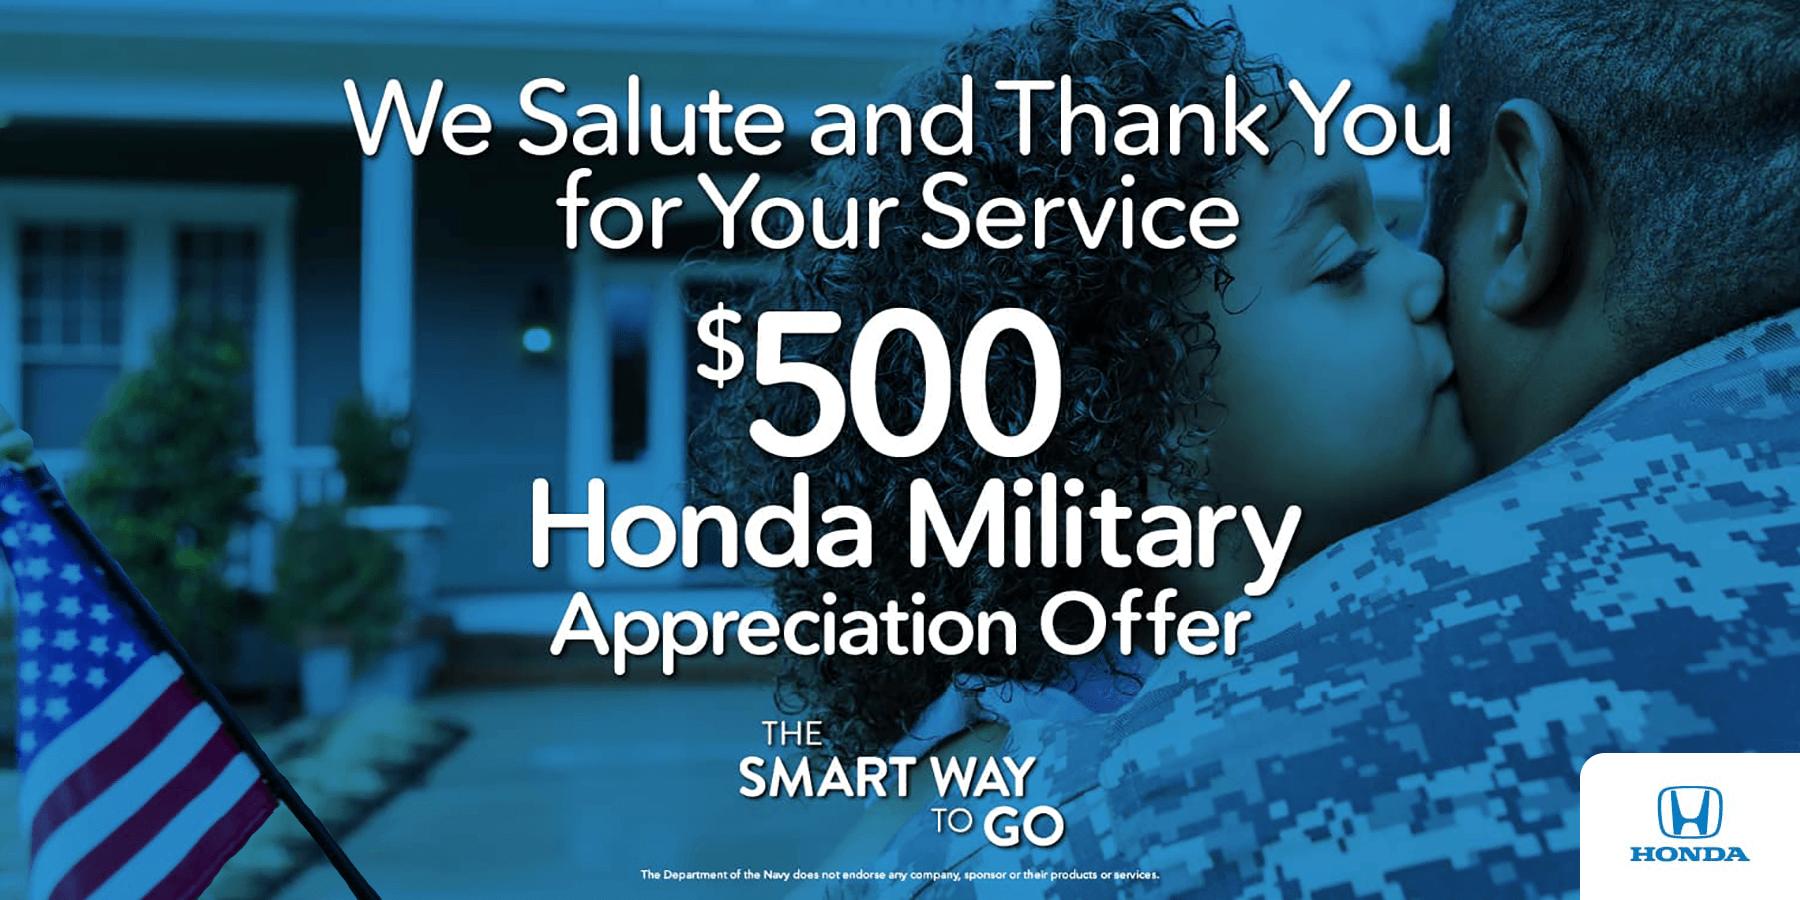 2019 Honda Military Appreciation Offer HP Slide